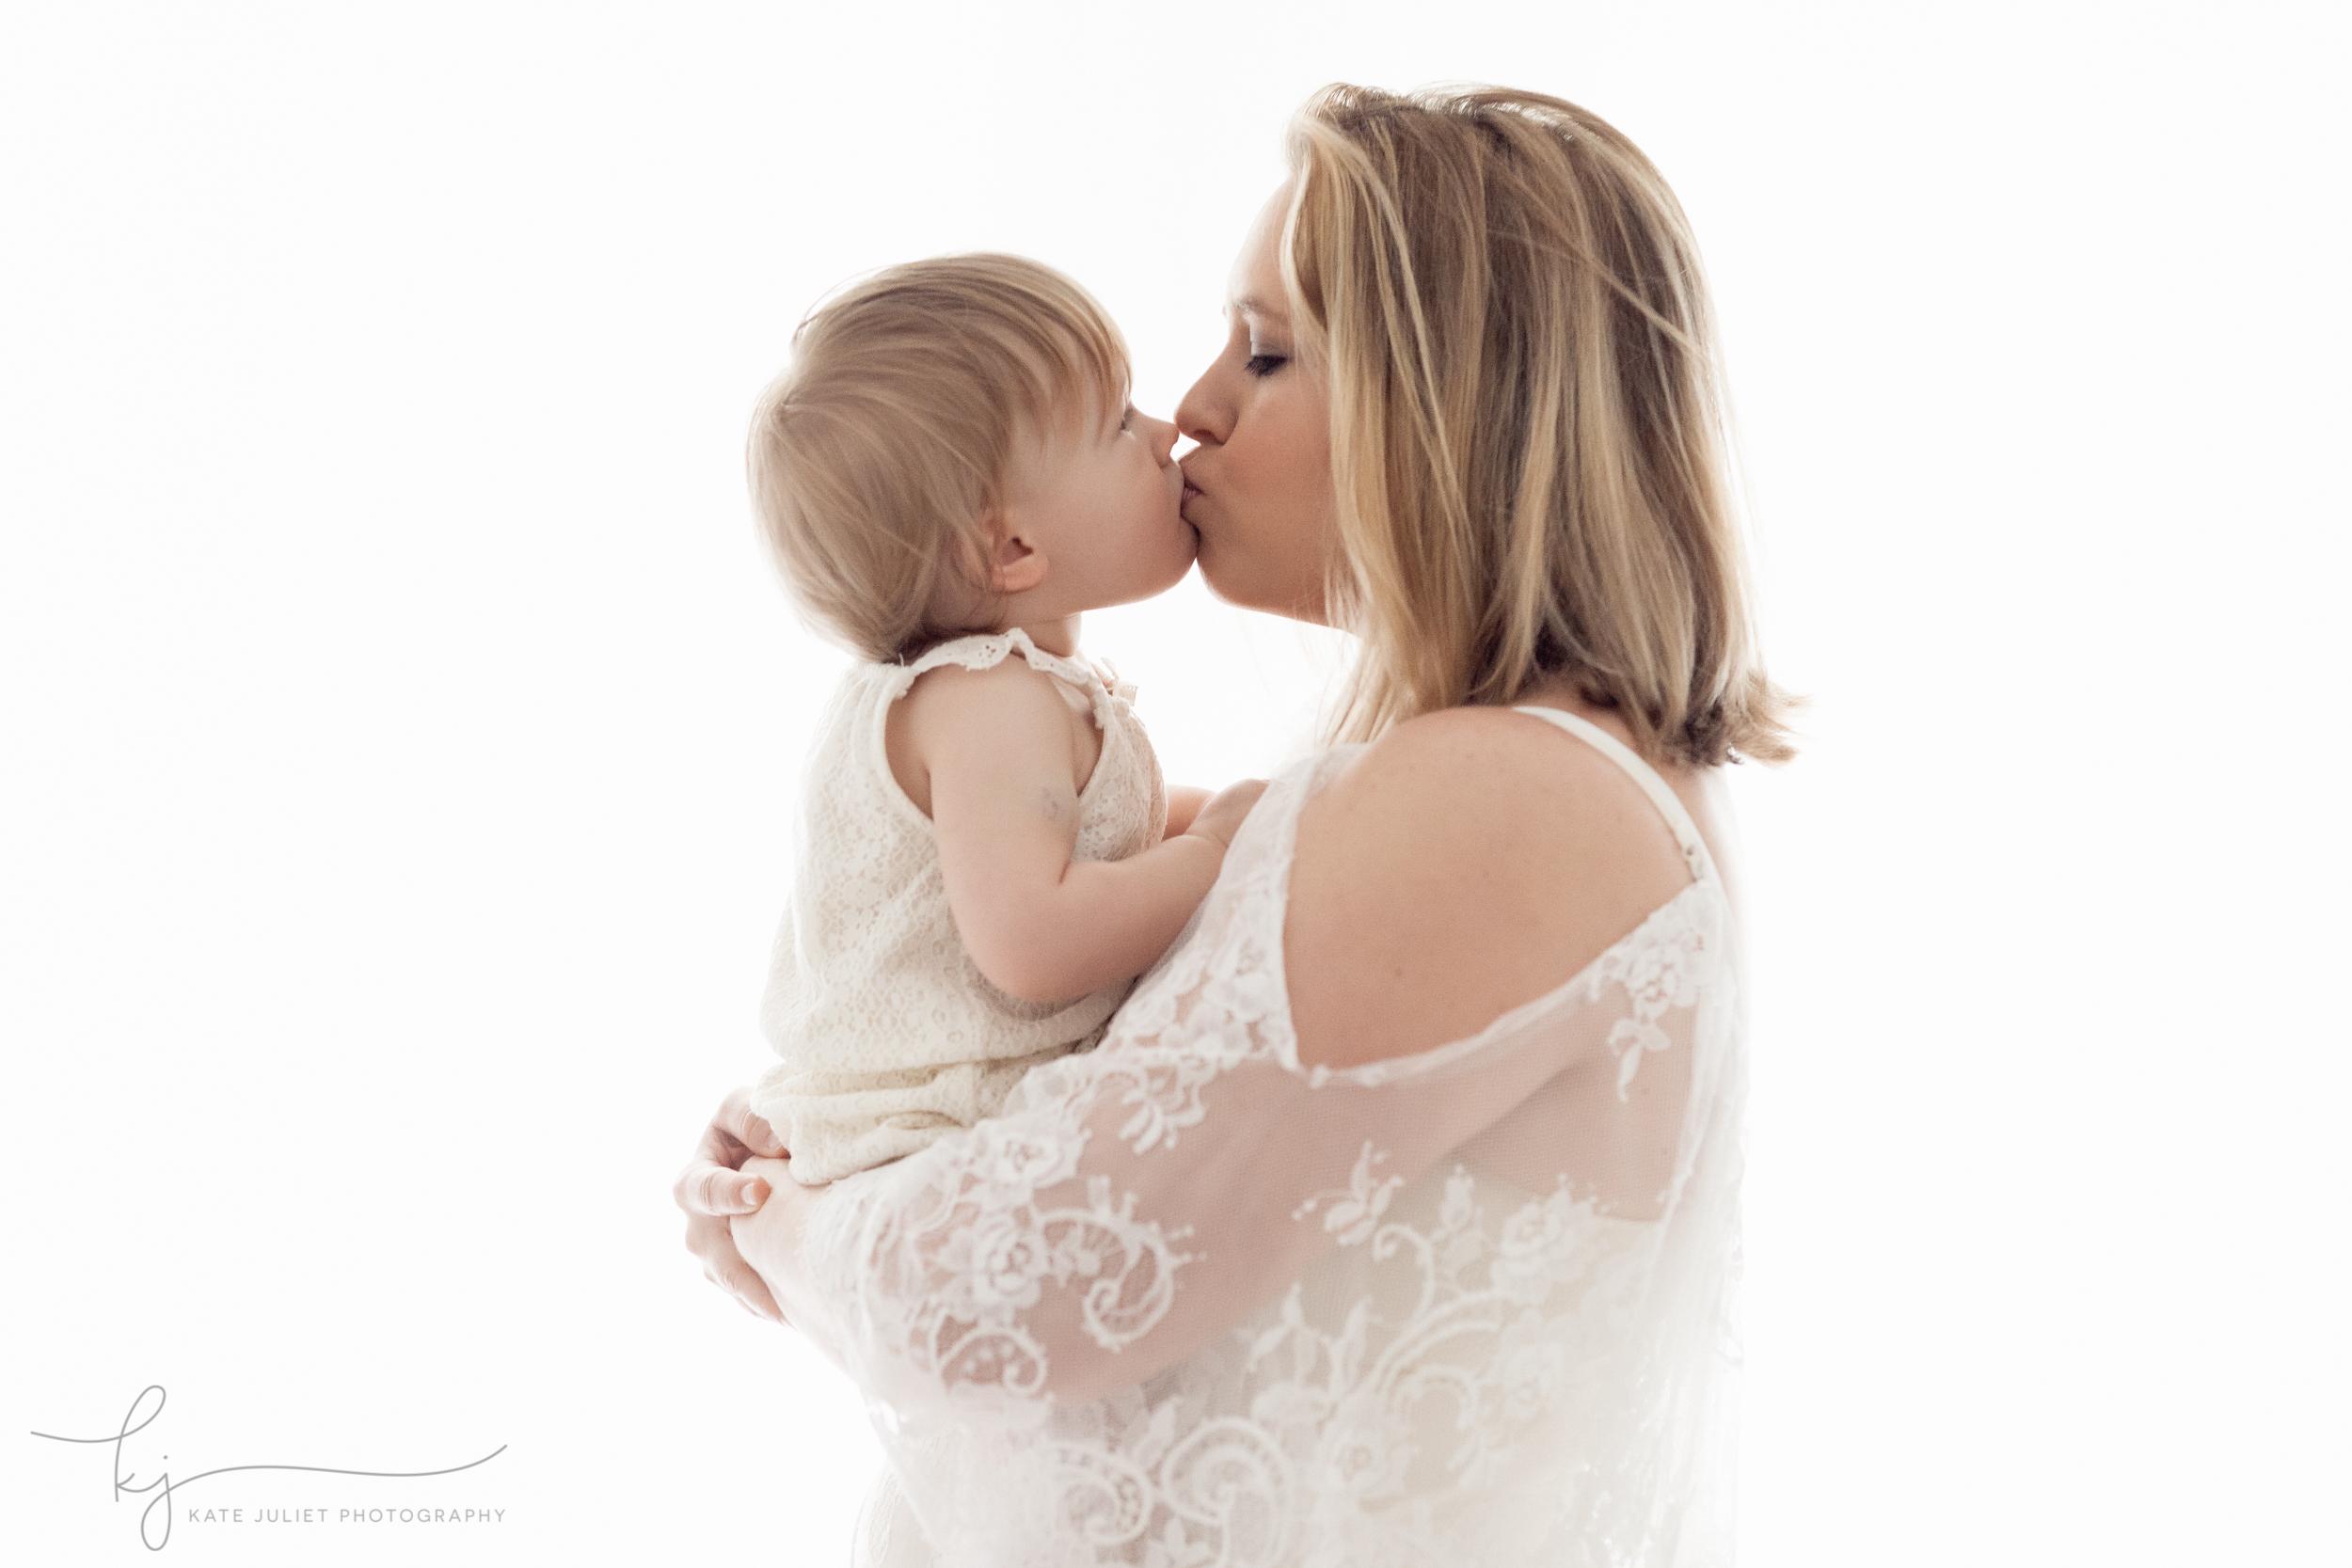 Fairfax VA Toddler Photographer | Kate Juliet Photography